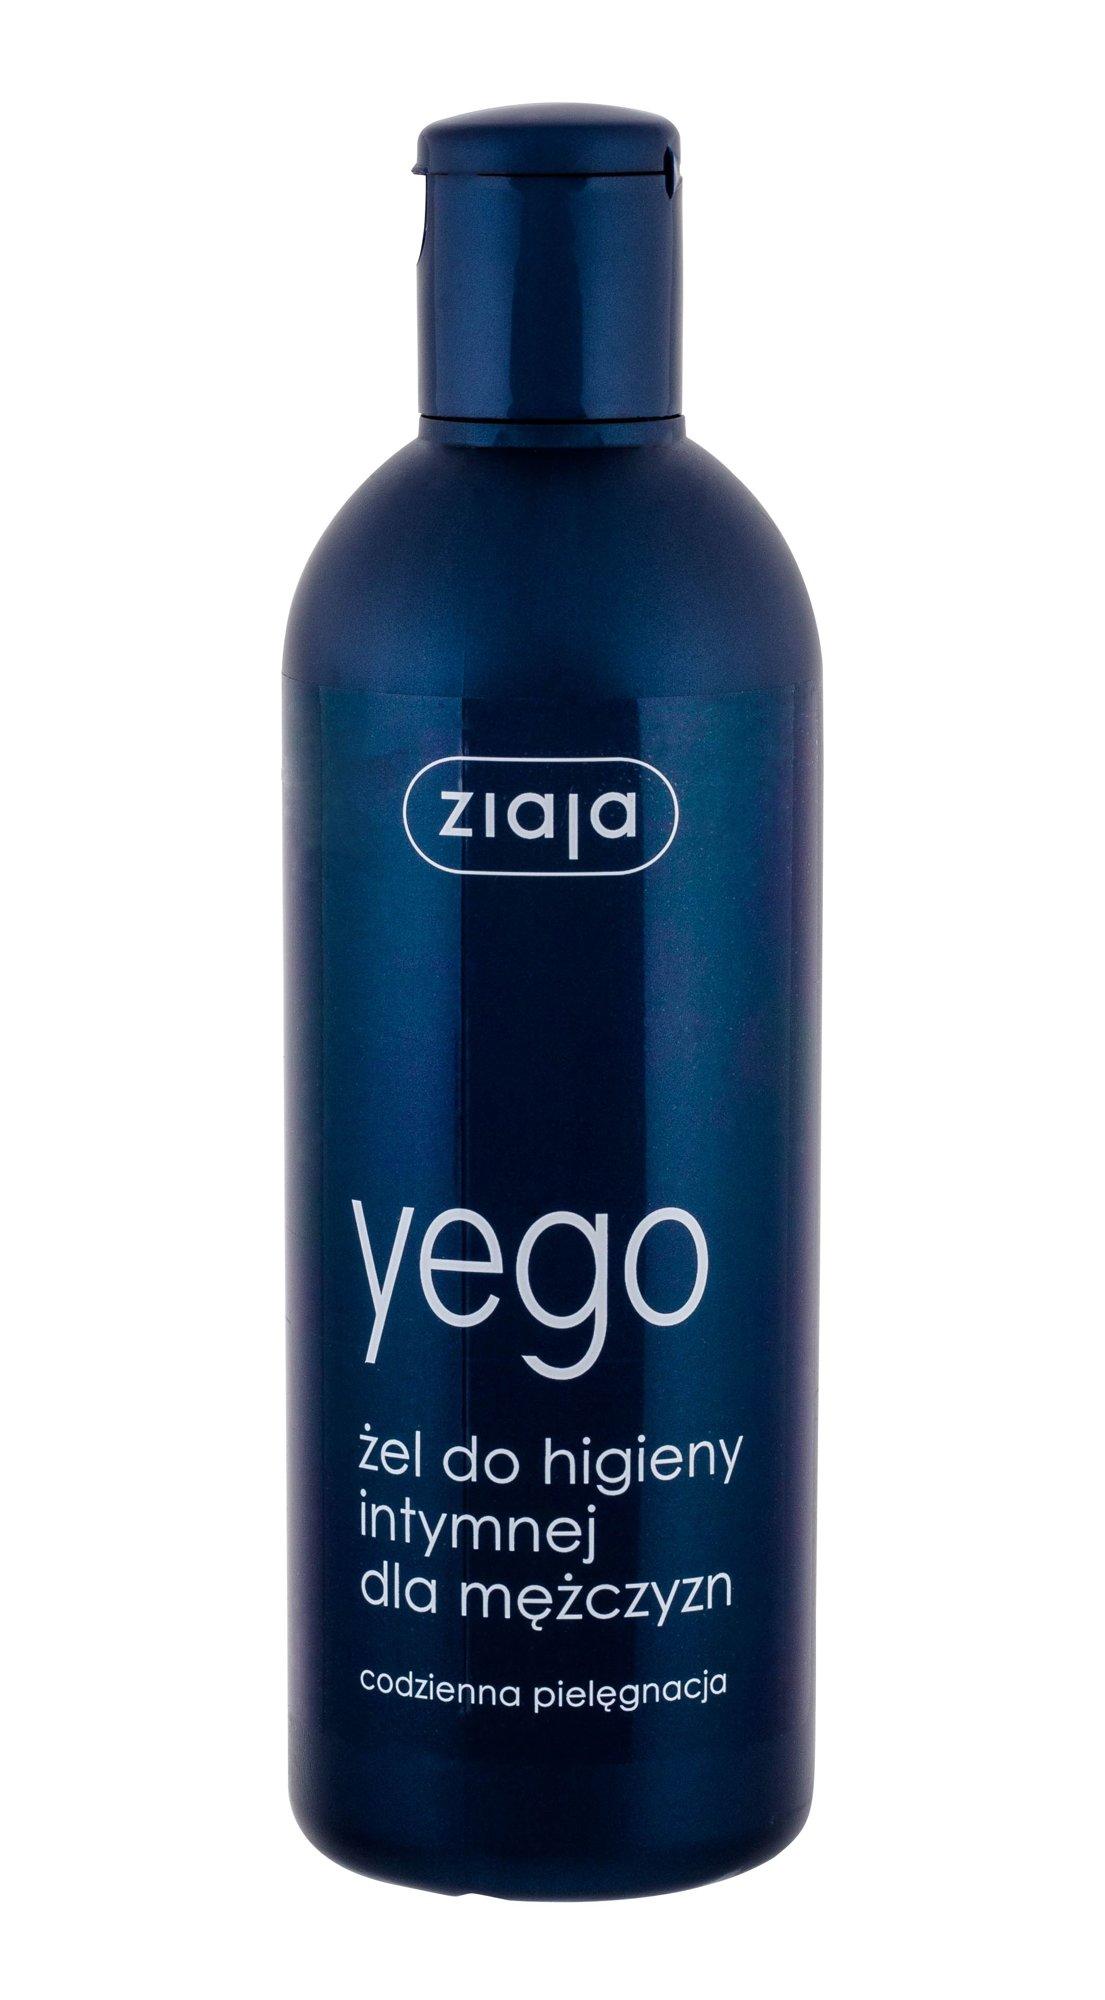 Ziaja Men Intimate Cosmetics 300ml